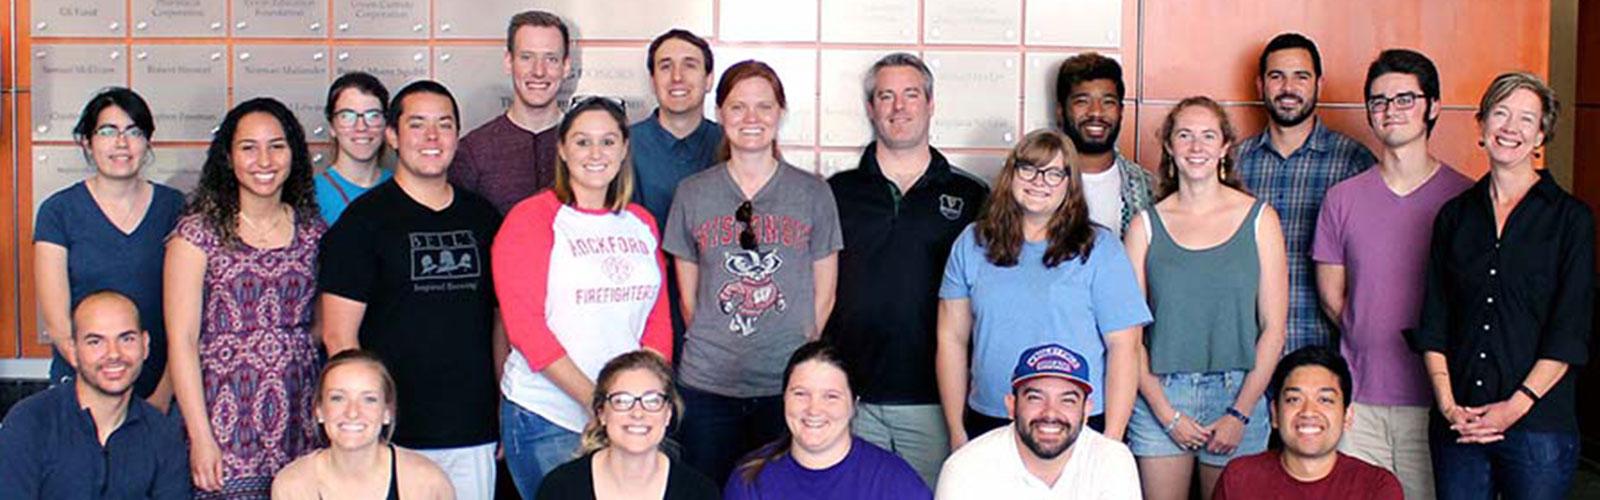 Photo of CBIT group